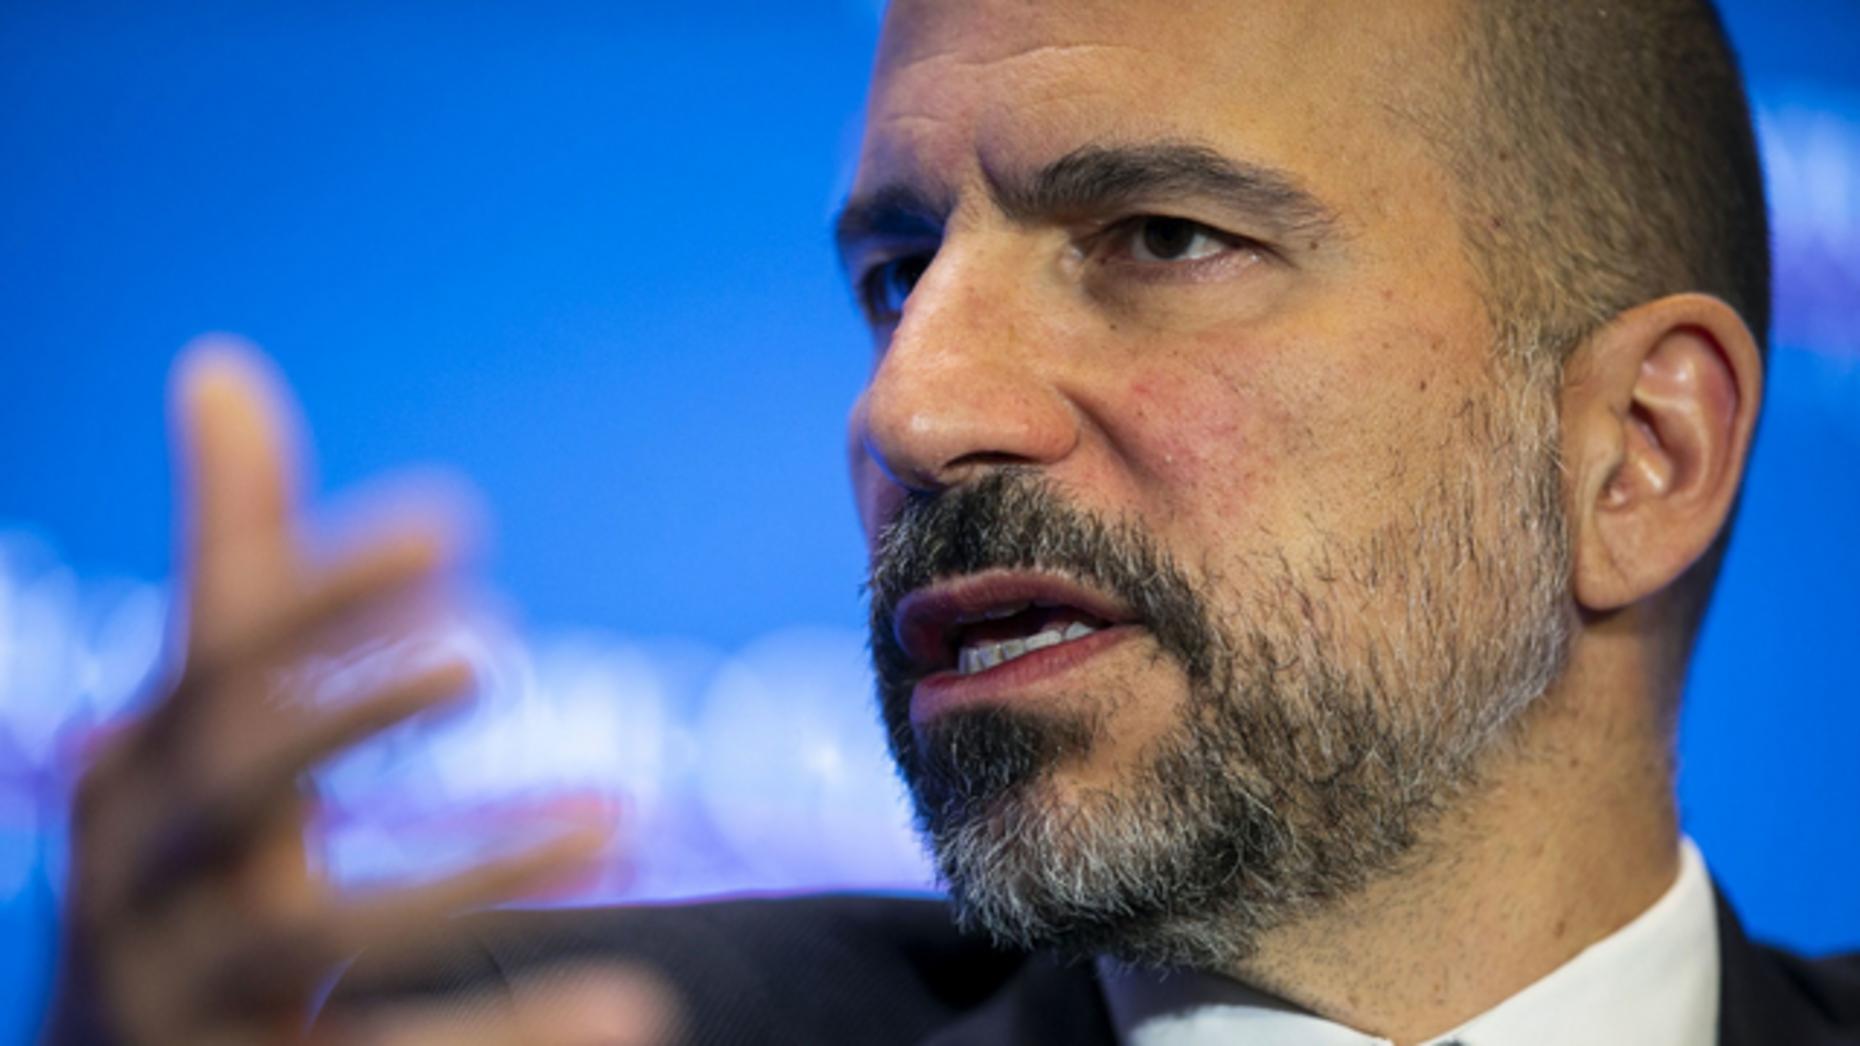 Dara Khosrowshahi, CEO of Uber, in June 2019. Photo by Bloomberg